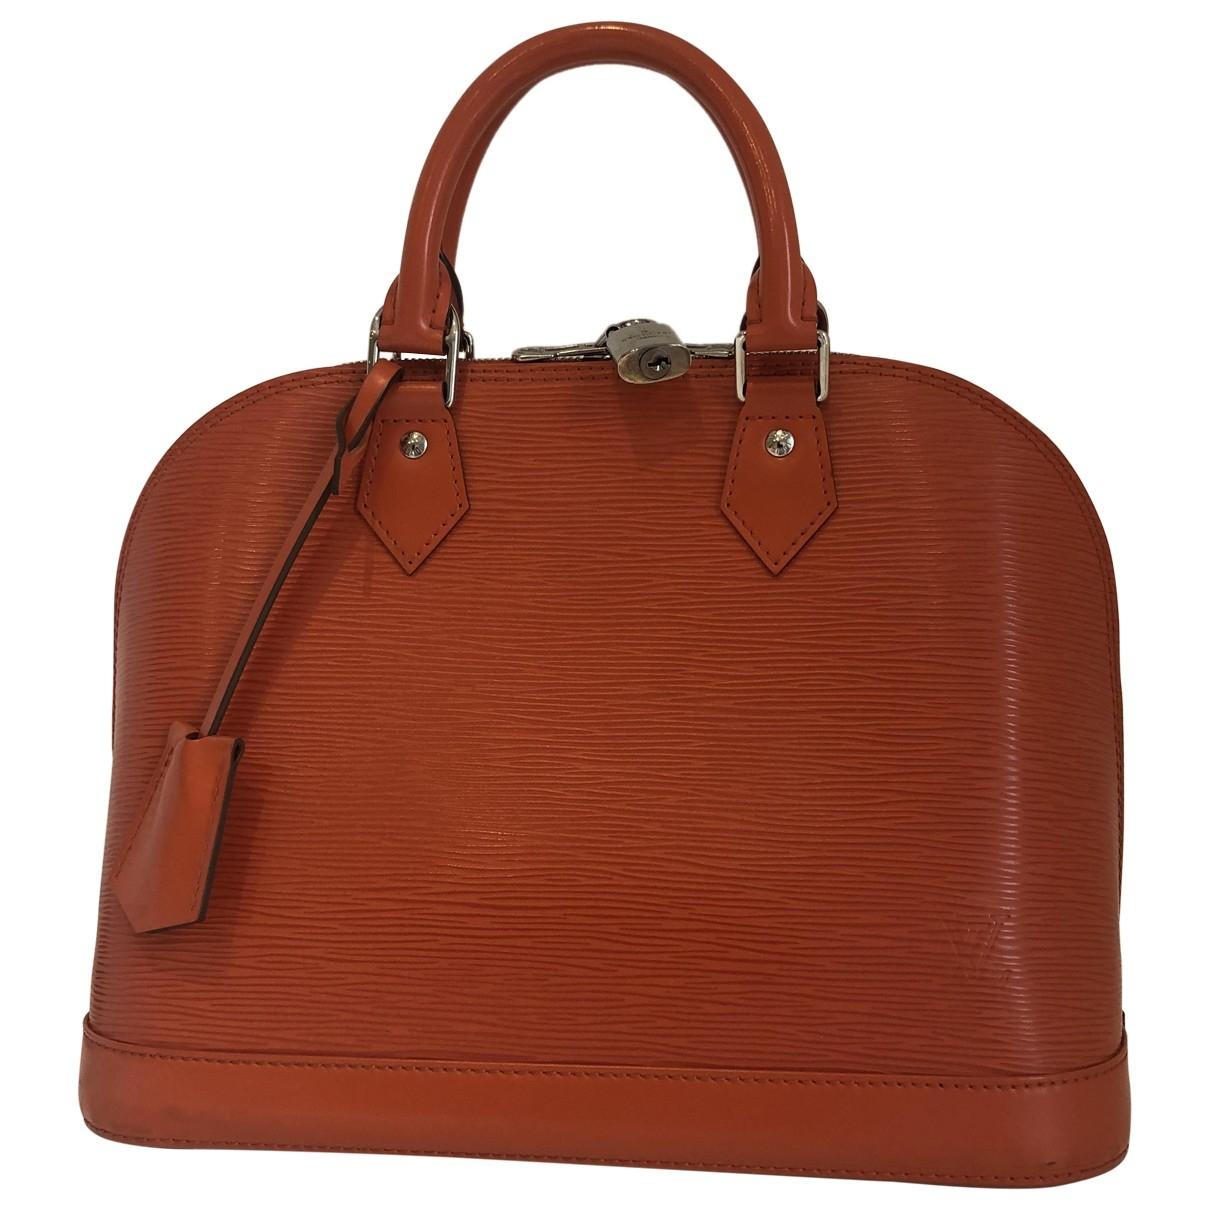 Louis Vuitton - Sac a main Alma pour femme en cuir - orange